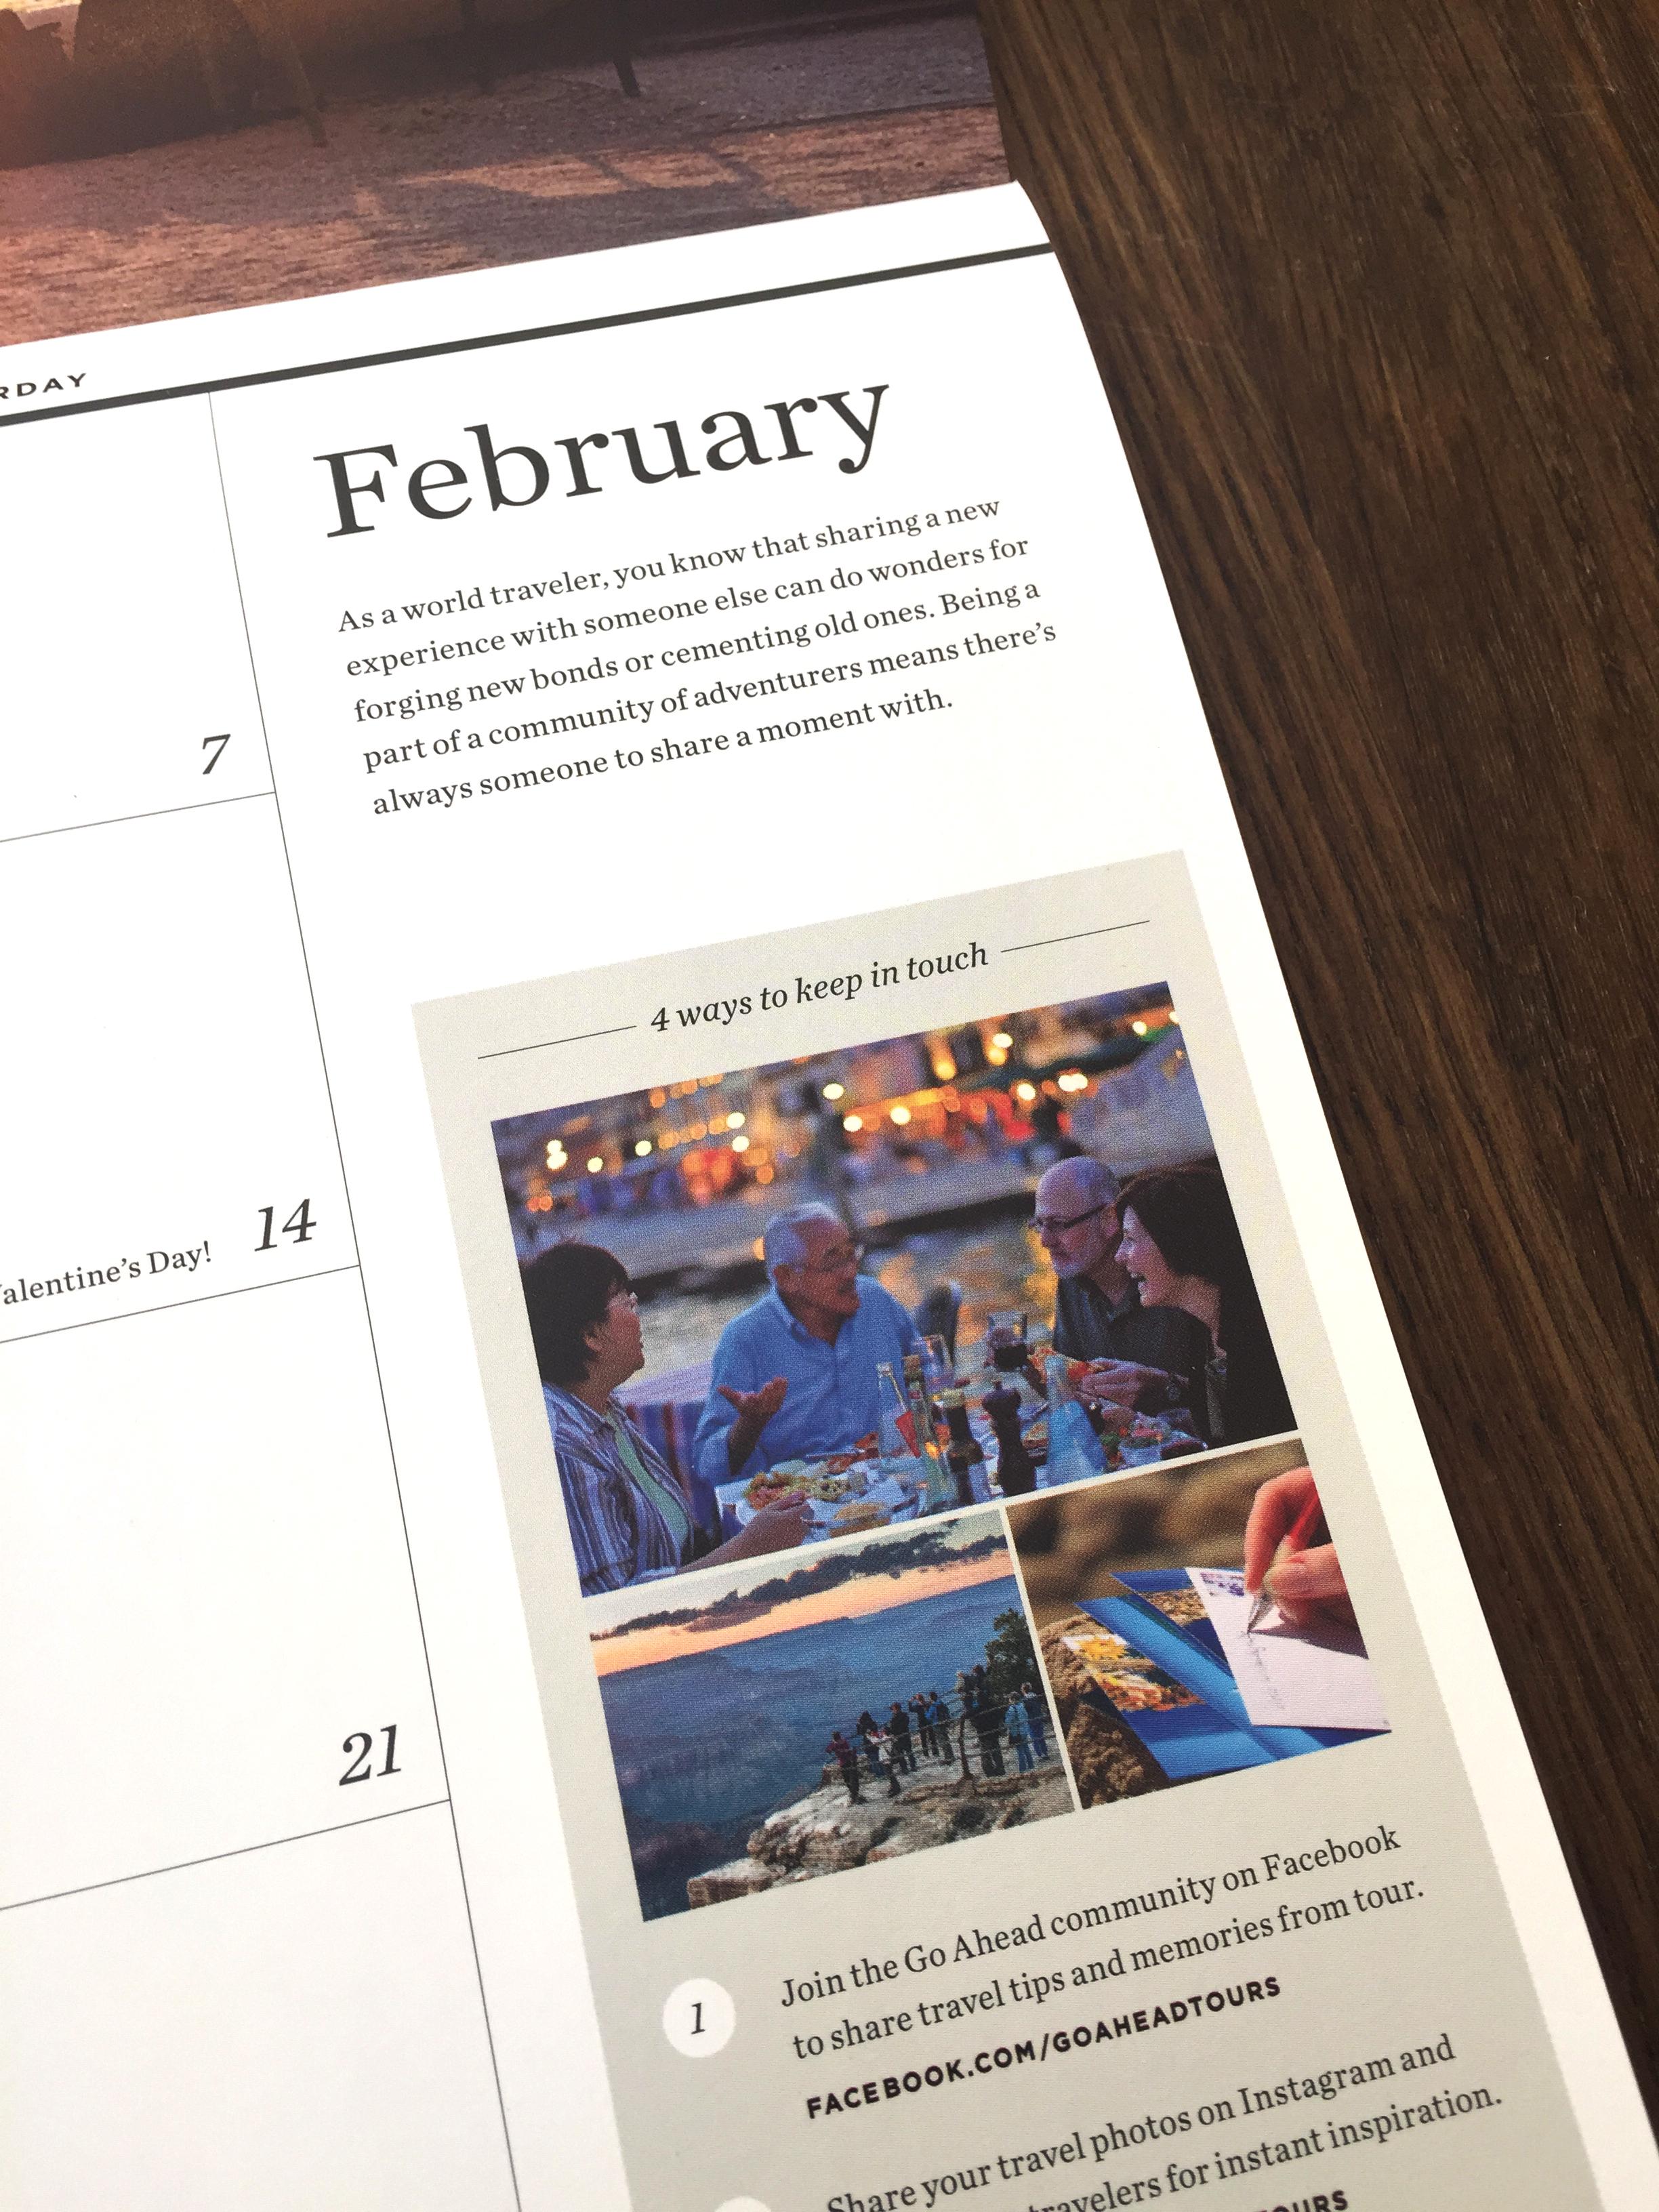 Calendar_February closeup.jpg